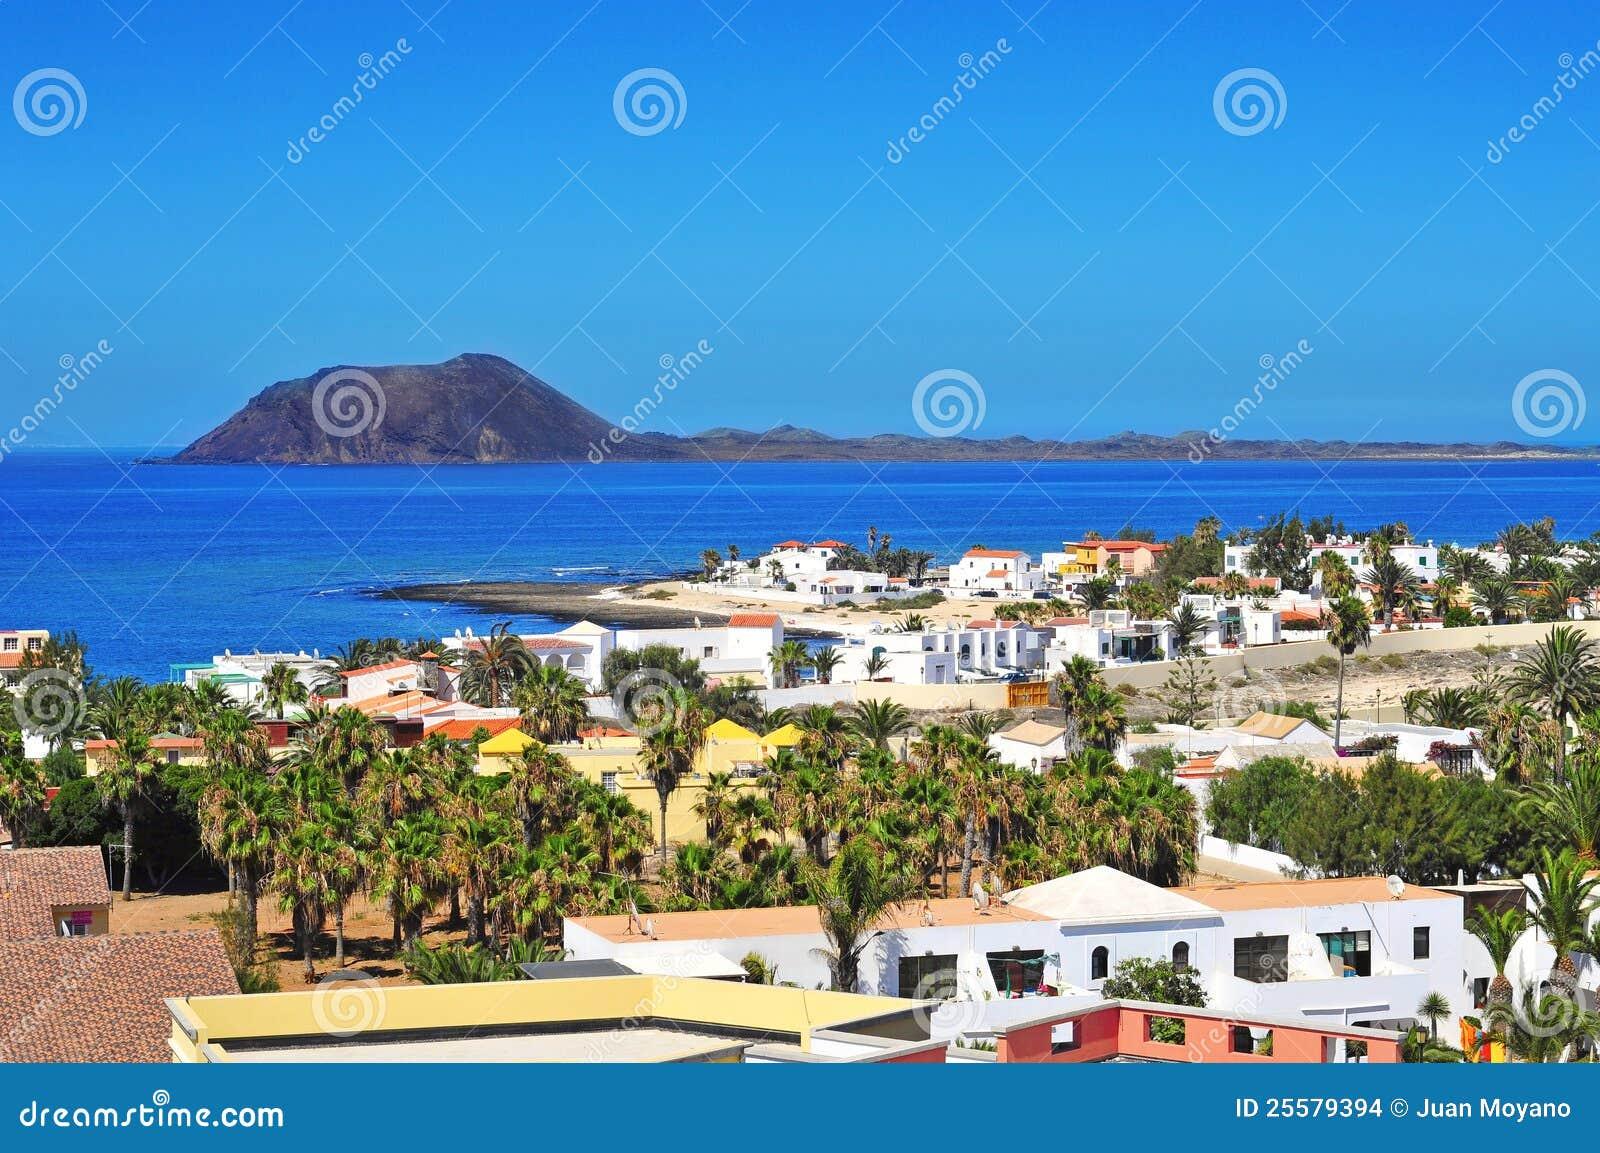 Lobos Insel Und Corralejo In Fuerteventura, Spanien Stockfoto - Bild ...